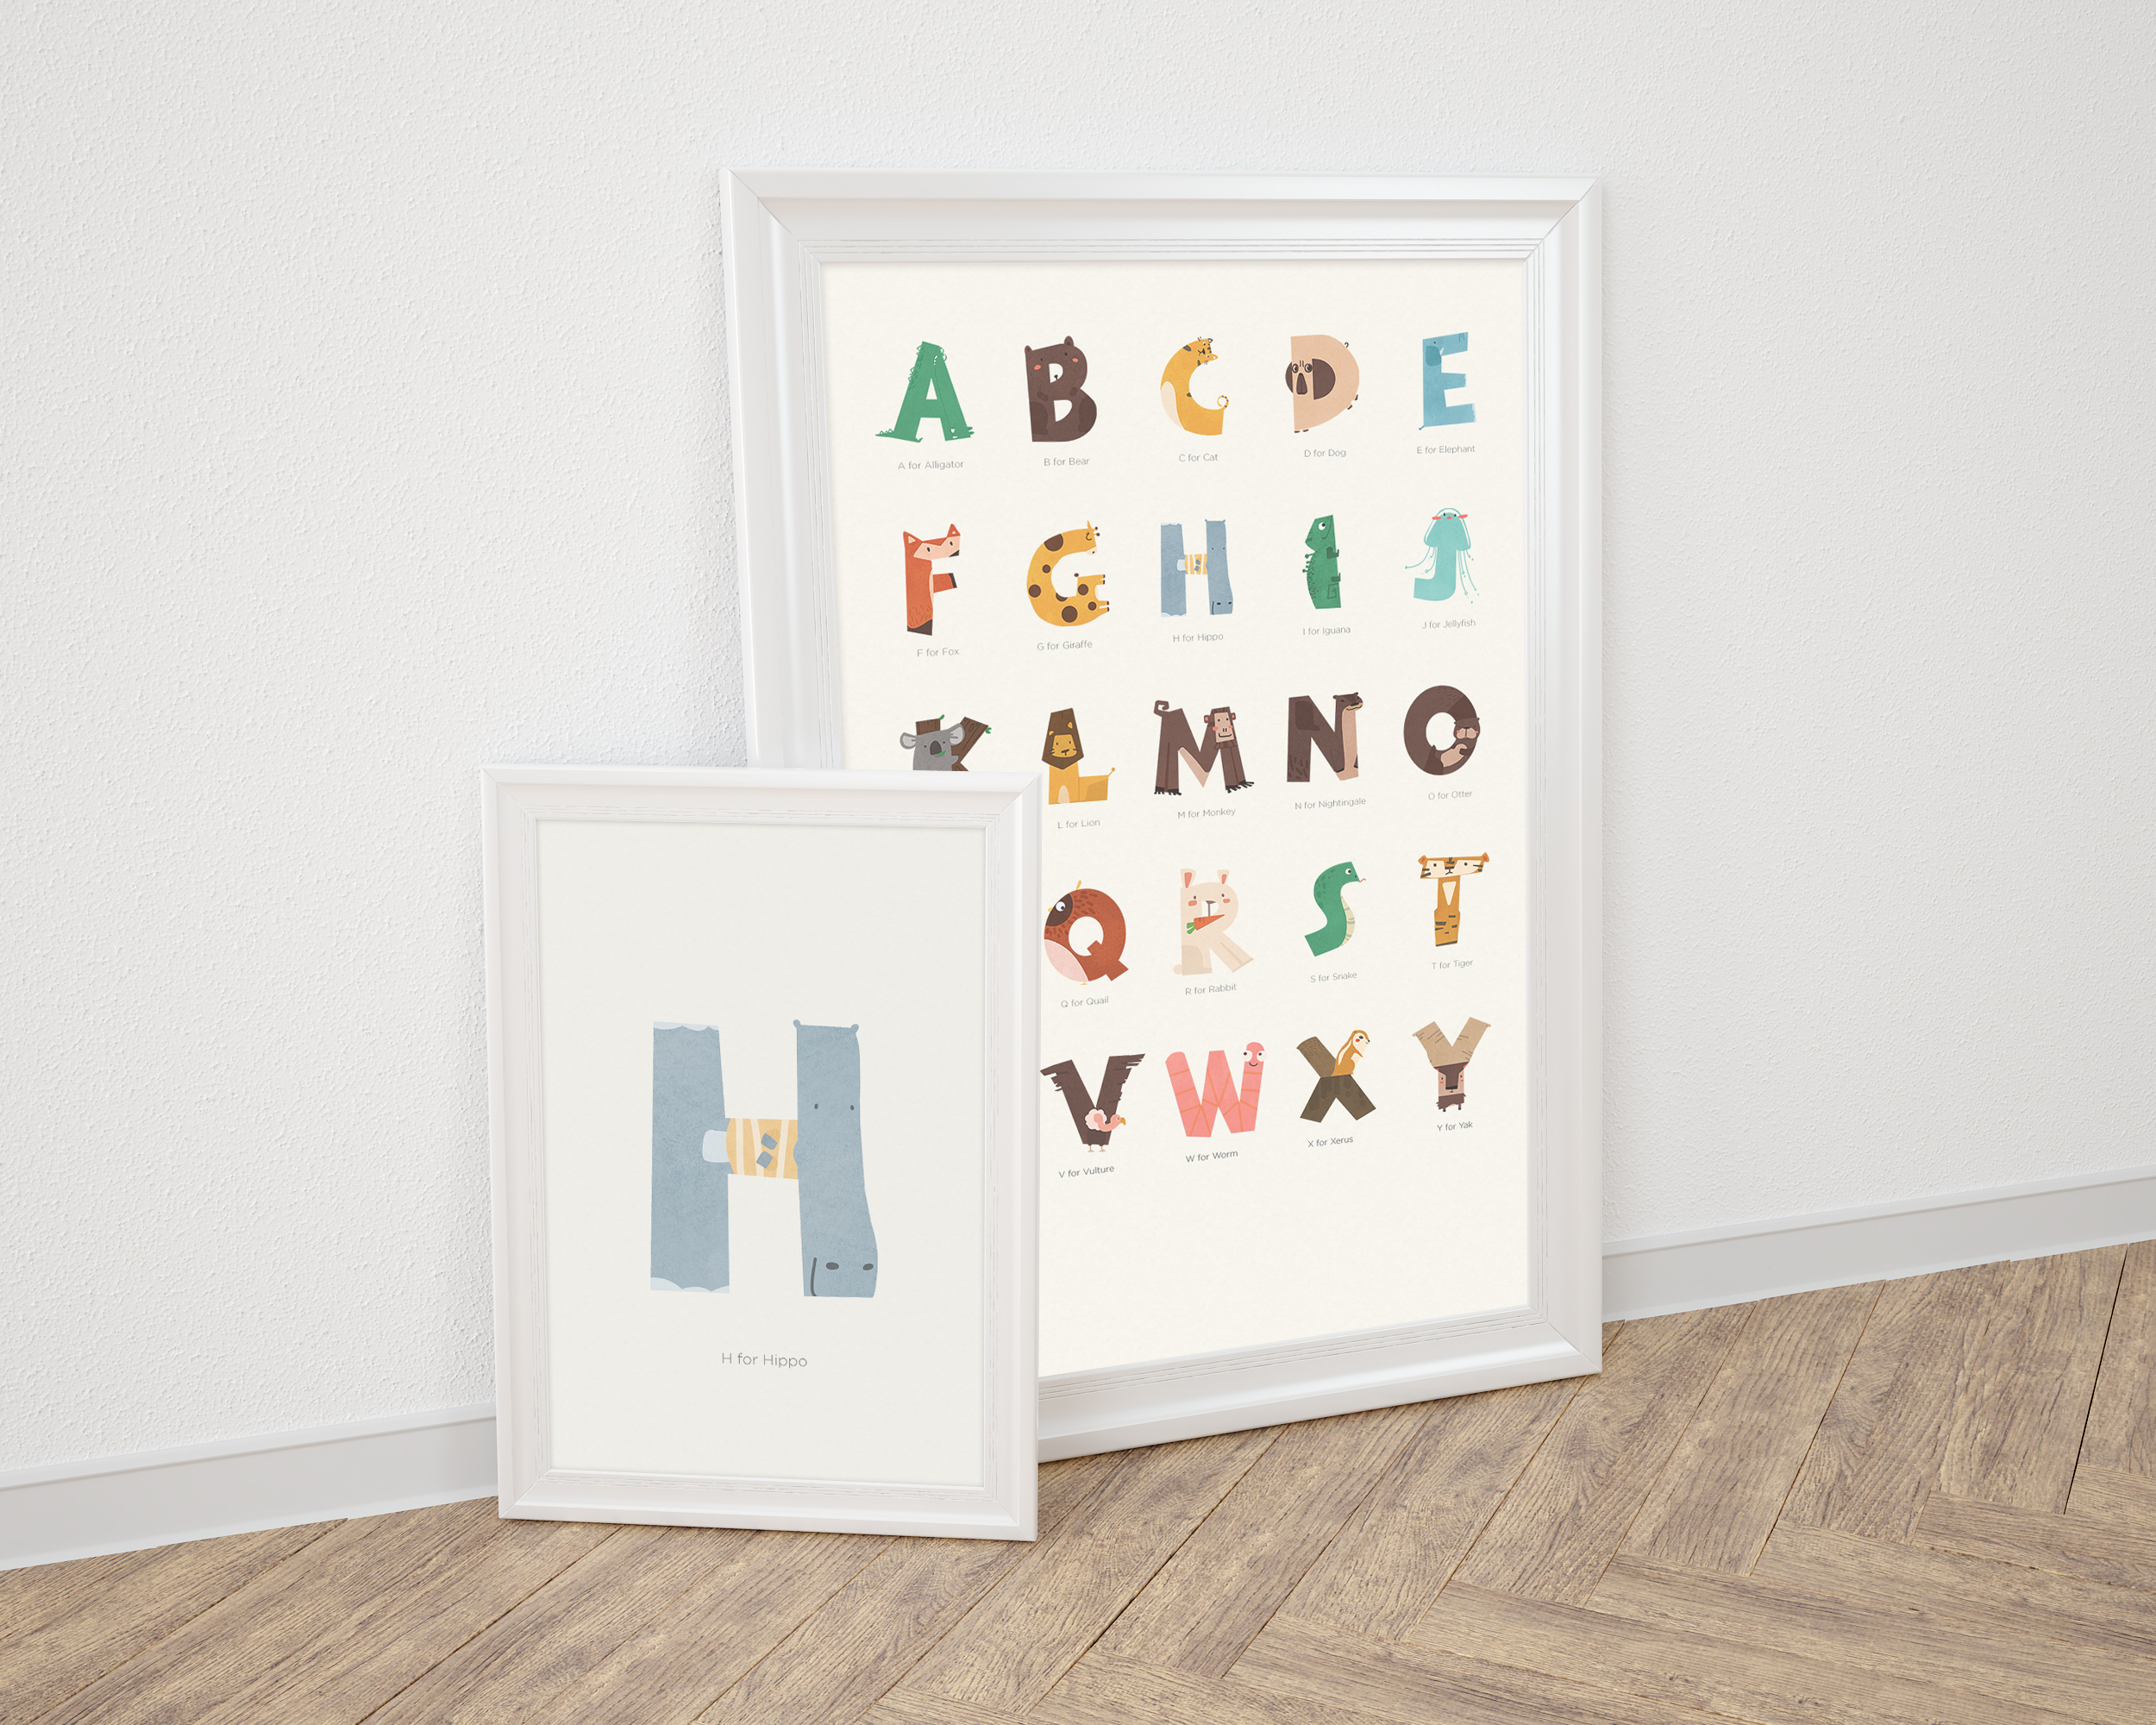 small-and-big-poster-frame-mockup.jpg